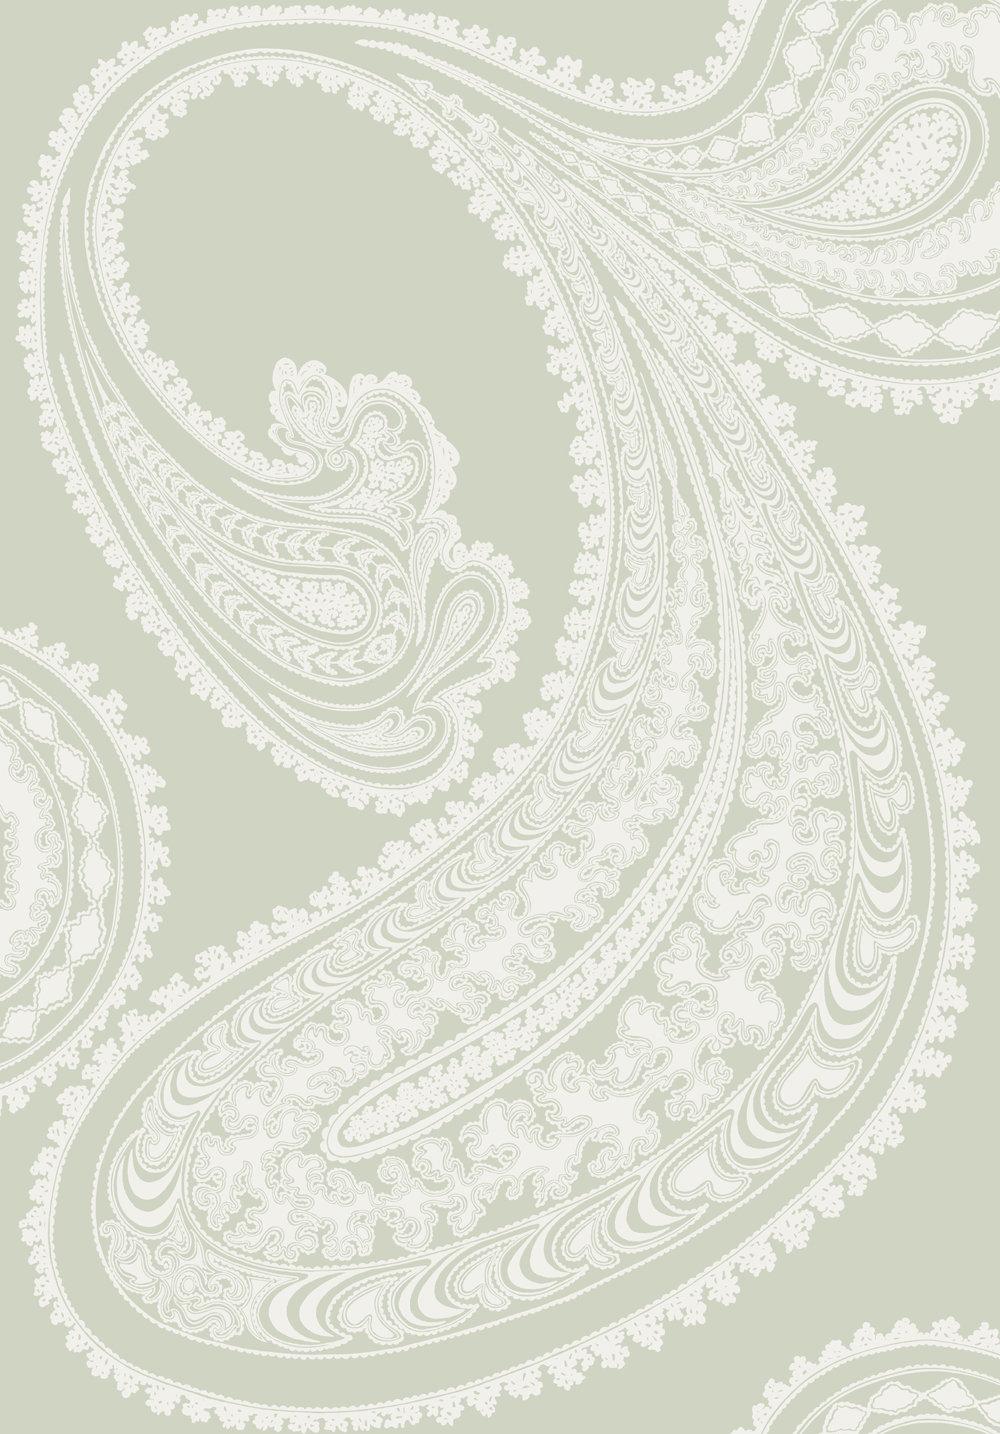 Cole Son Rajapur White Soft Grey Wallpaper Main Image